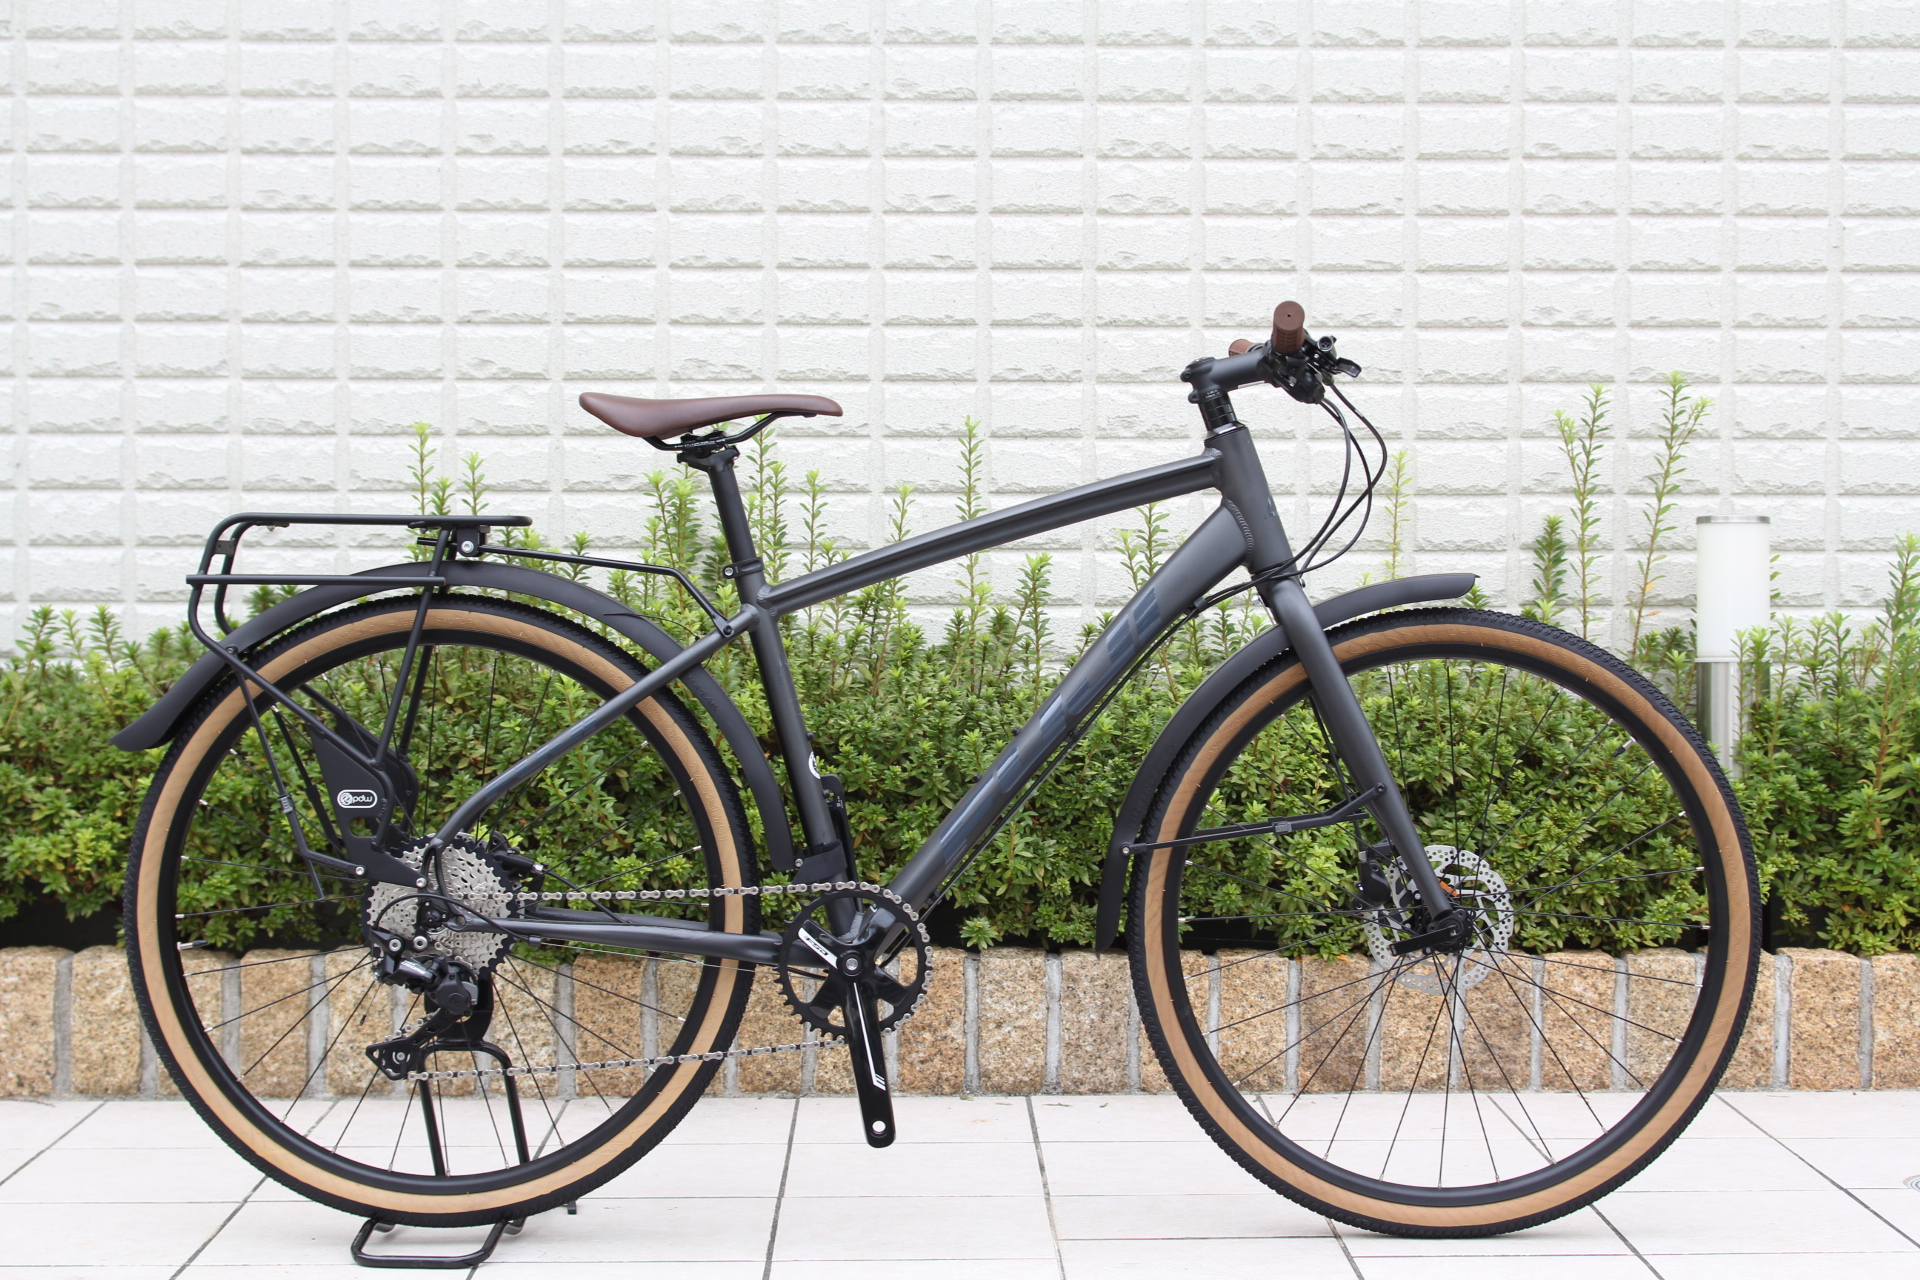 2020 FUJI『RAFFISTA』街乗りにもおすすめなグラベル系バイク